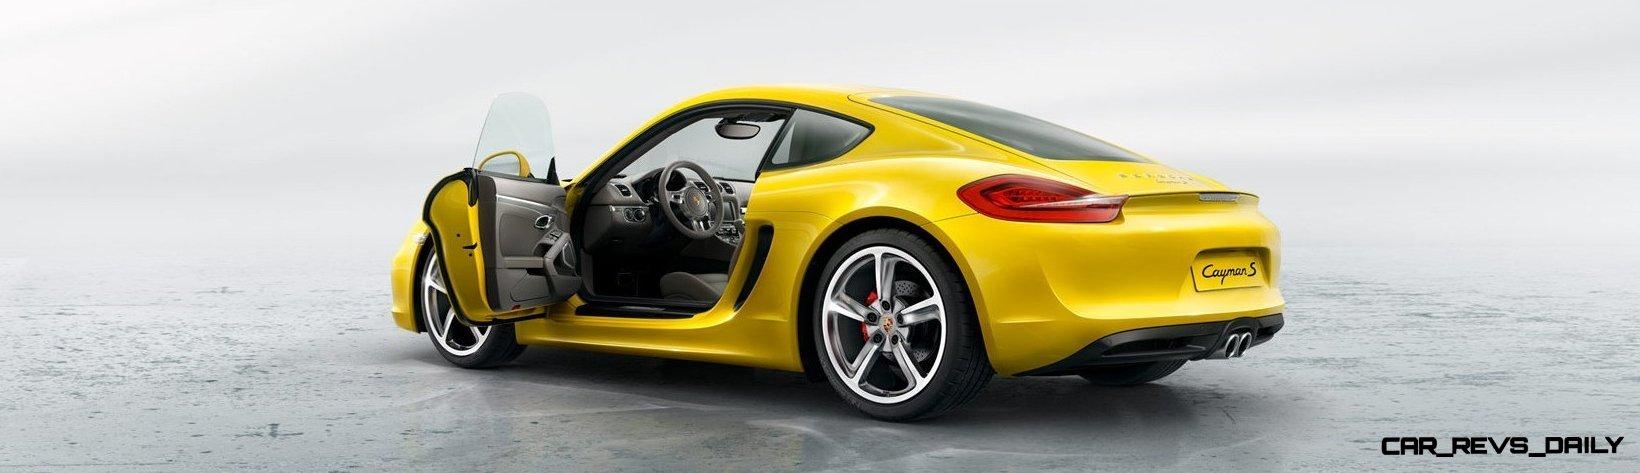 CarRevsDaily - Porsche CAYMAN Buyers Buide Photos 58